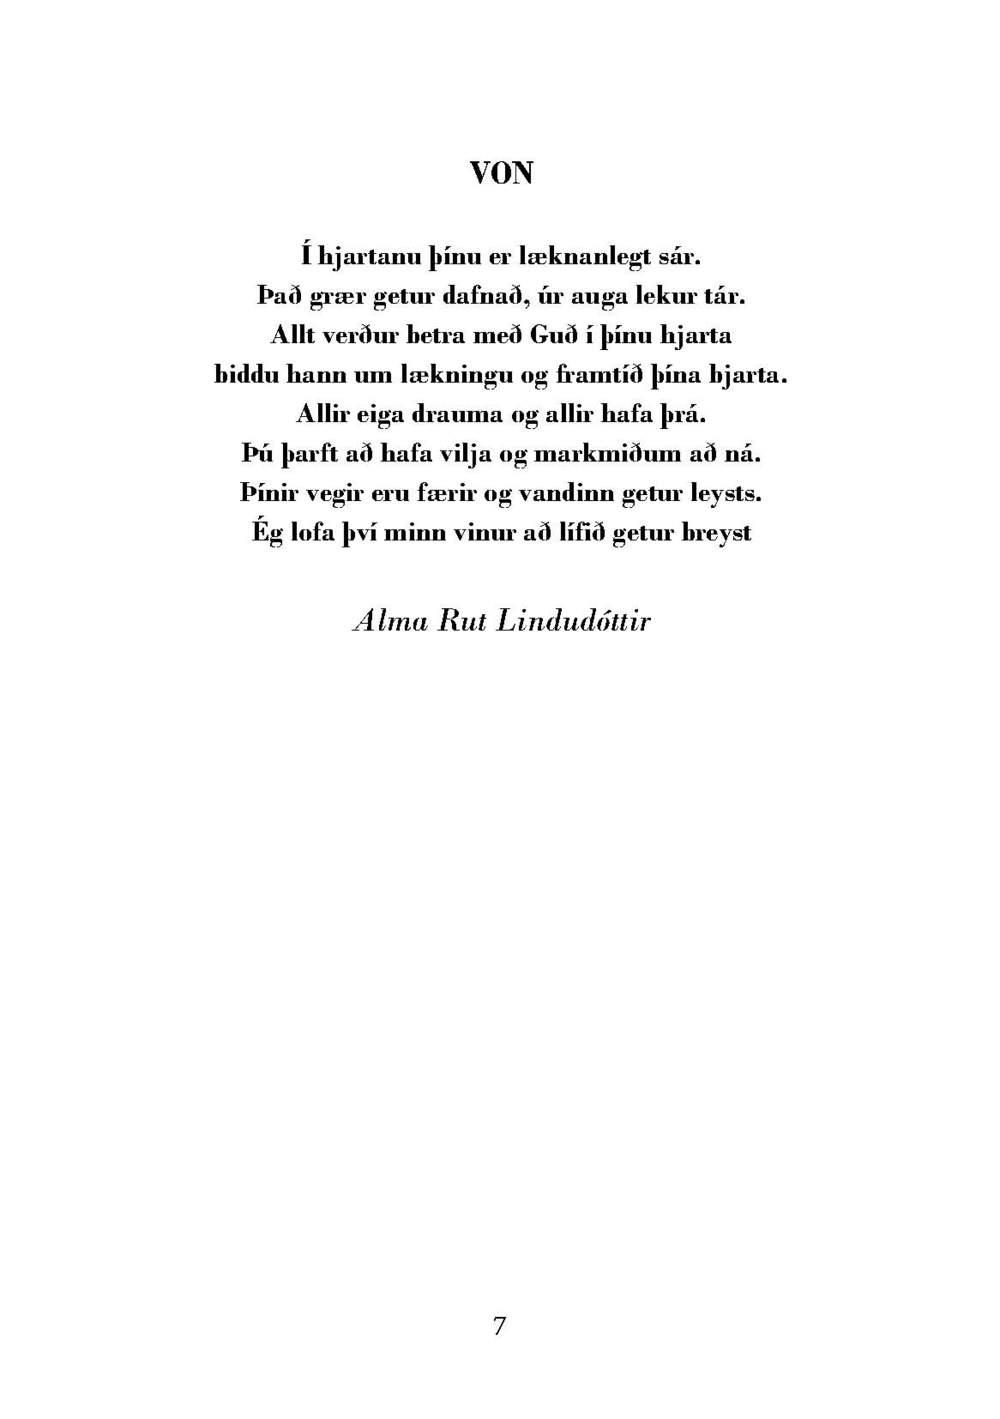 27073-ljodabokin--oll_Page_21.jpg